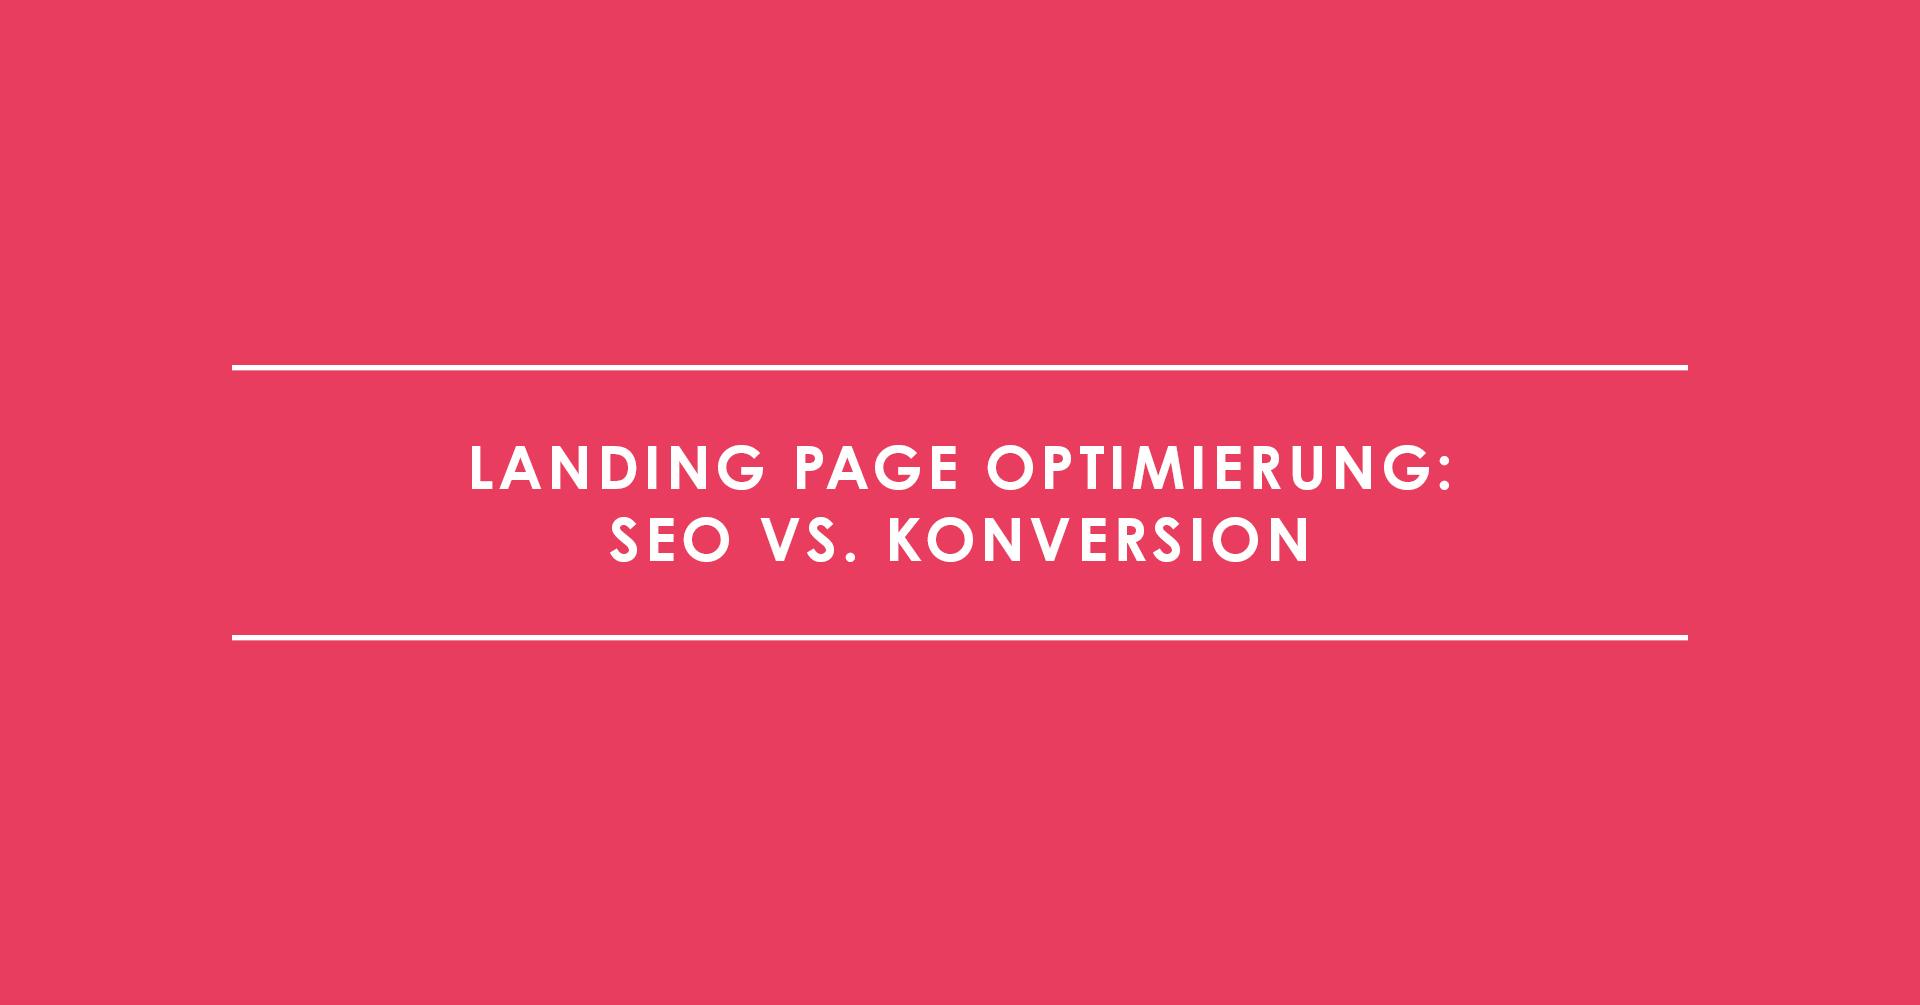 Landing Page Optimierung: SEO vs. Konversion